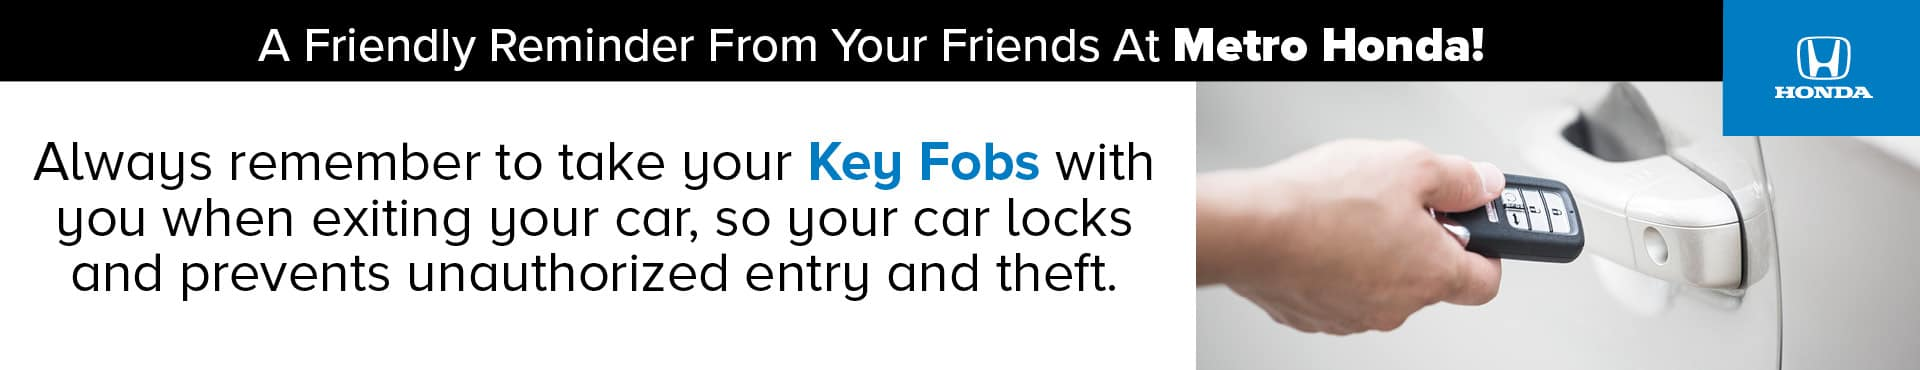 MetHon-1205 Key Fob reminder website social banners5